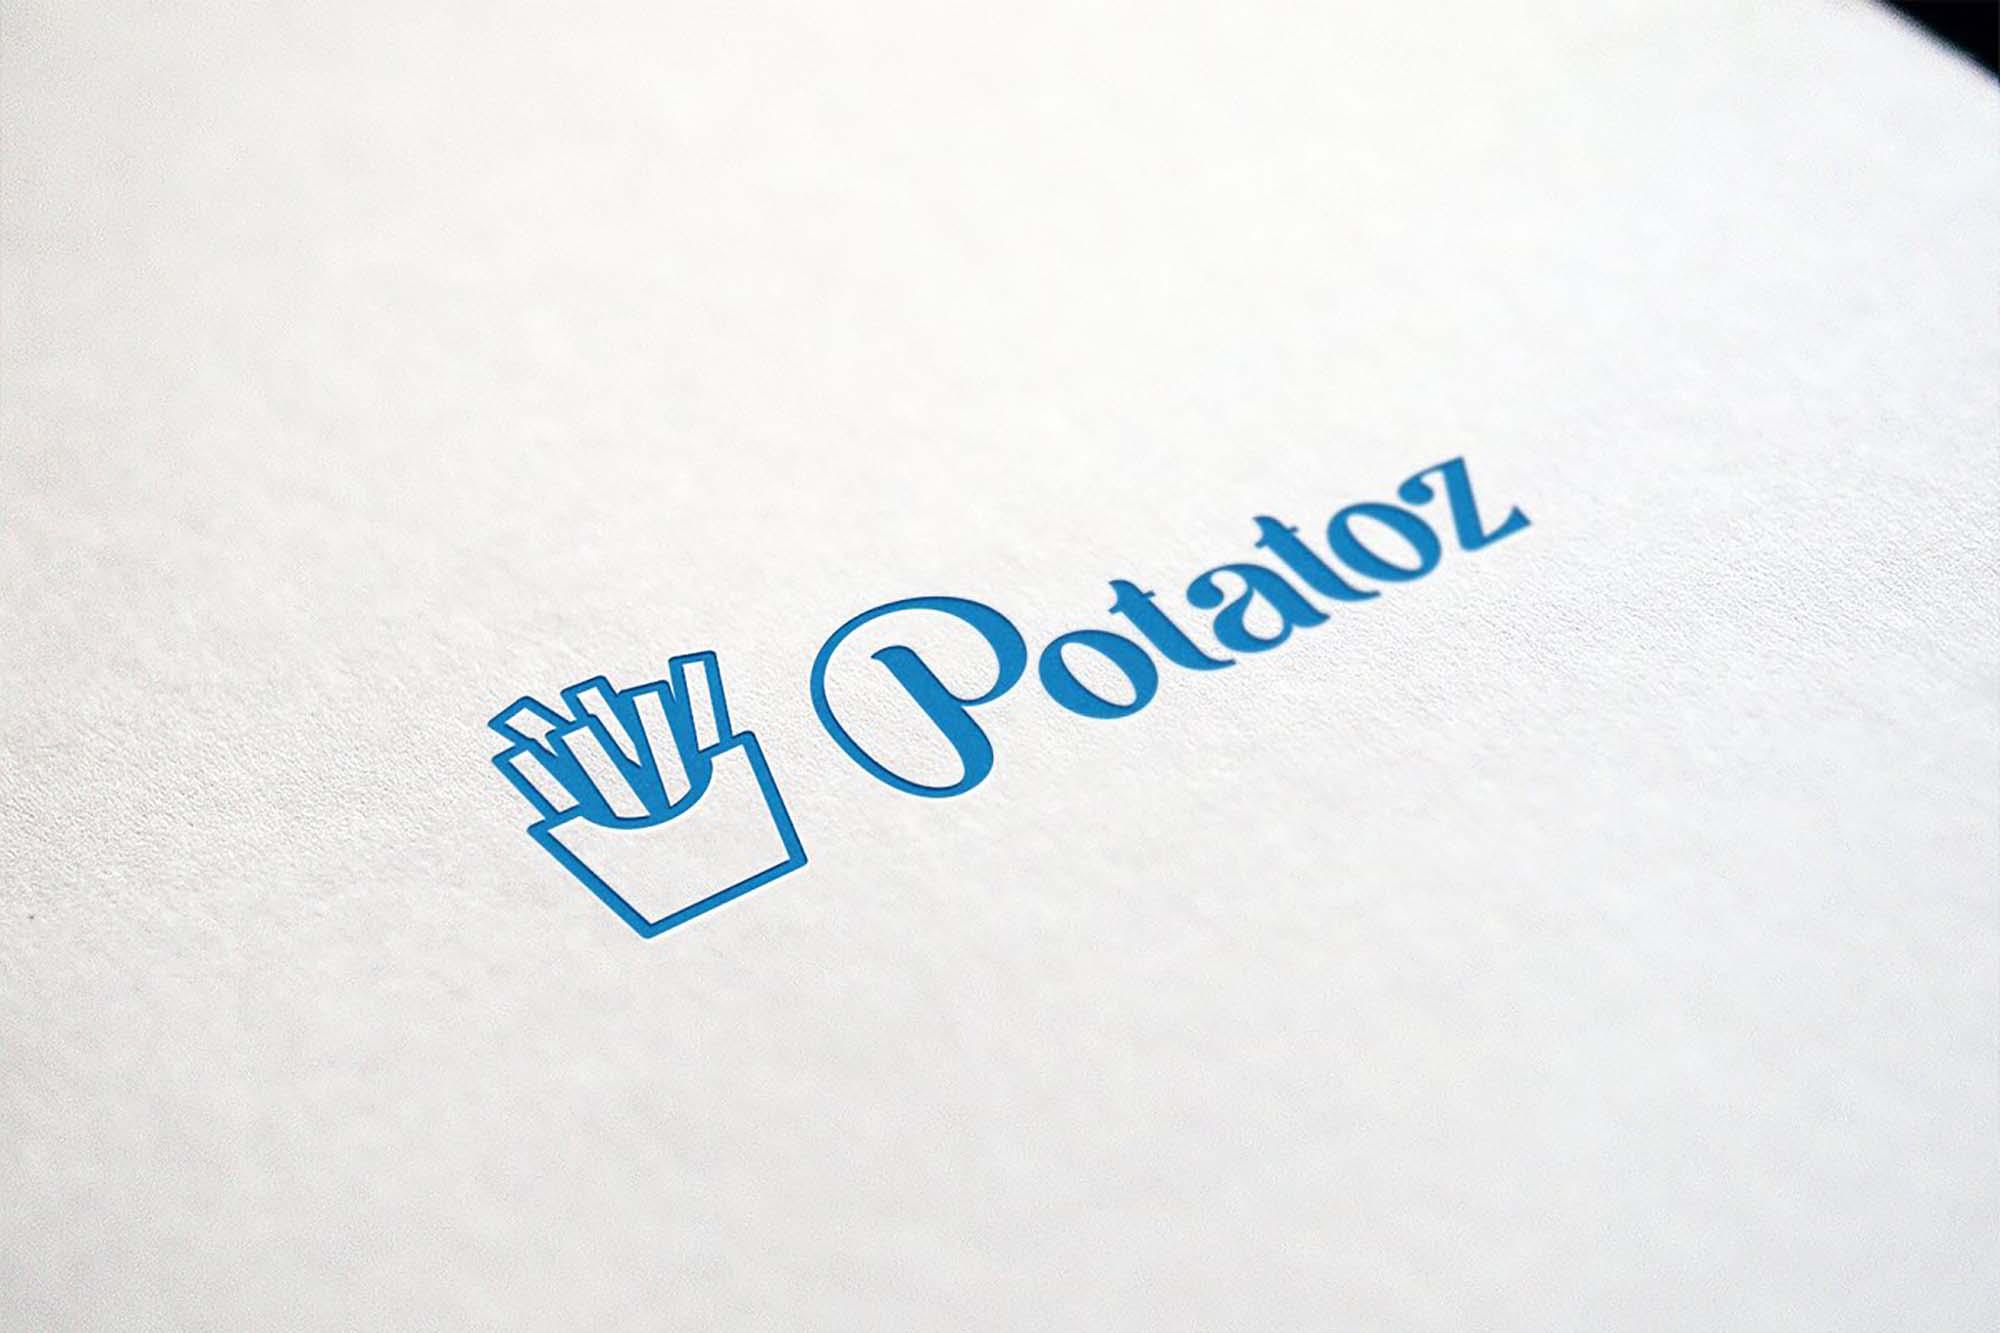 Mofita Font Logo